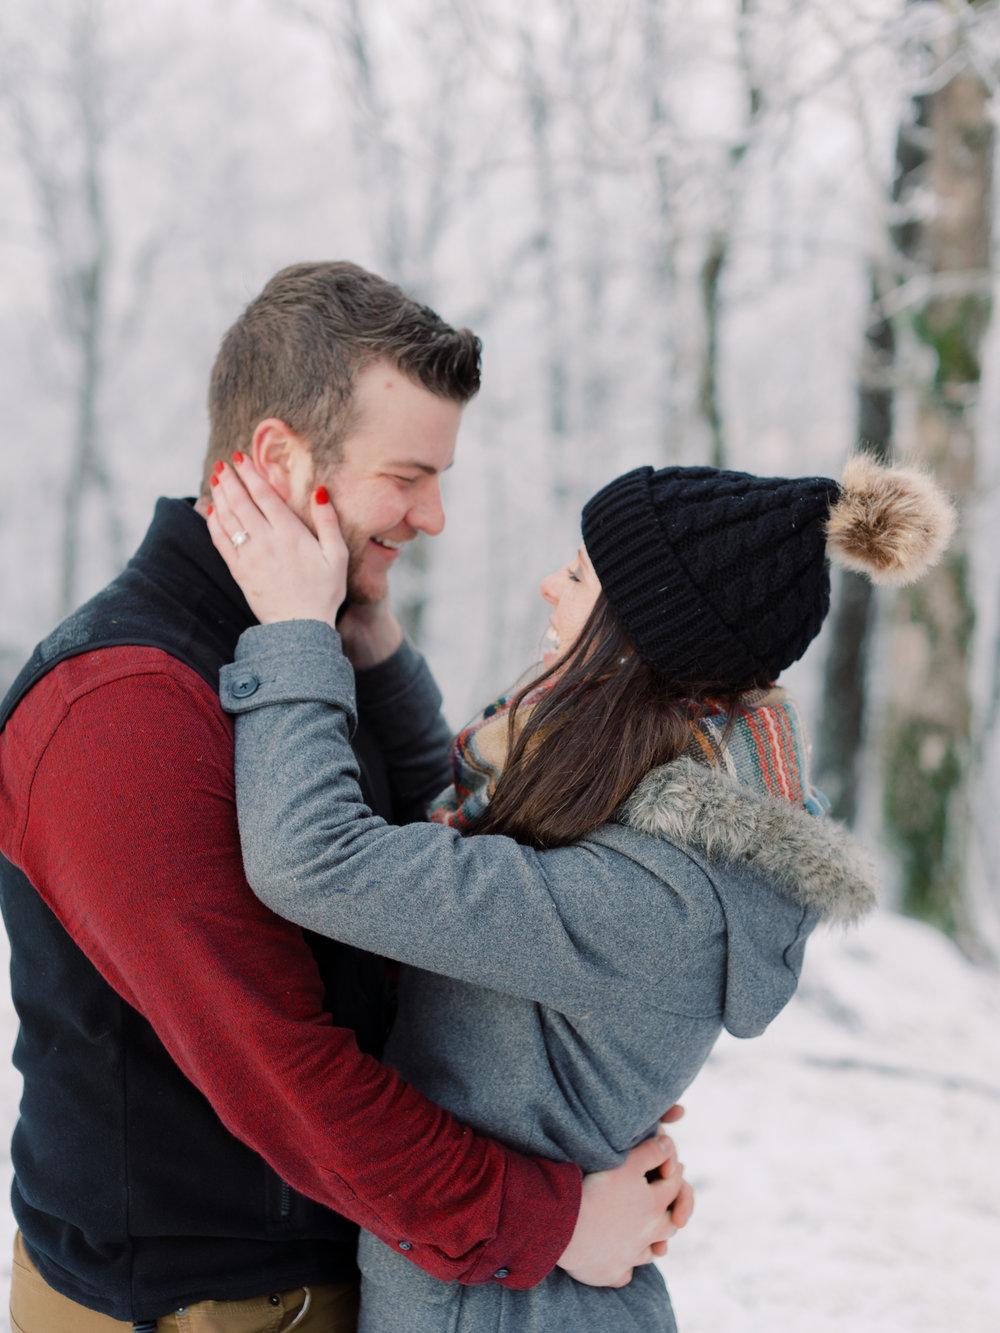 snowy-georgia-proposal-preachers-rock-atlanta-dahlonega-wedding-photographer-hannah-forsberg-fine-art-film-22.jpg